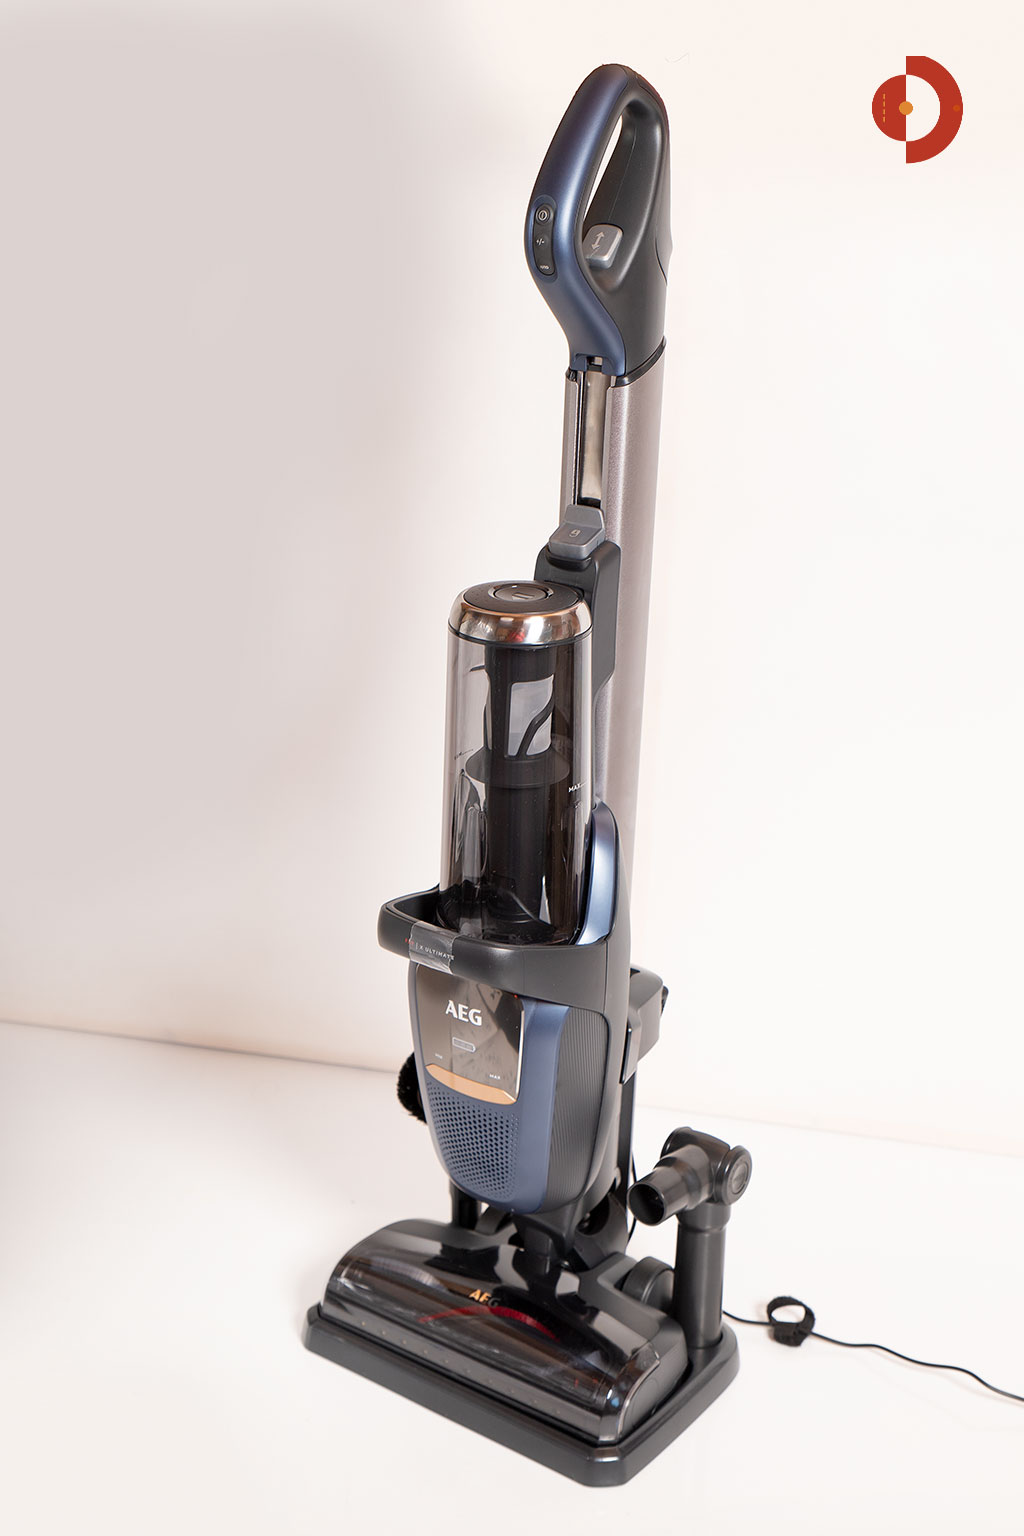 akkustaubsauger aeg fx9 1 ibm test akkusauger hochformat akku und roboter staubsauger. Black Bedroom Furniture Sets. Home Design Ideas